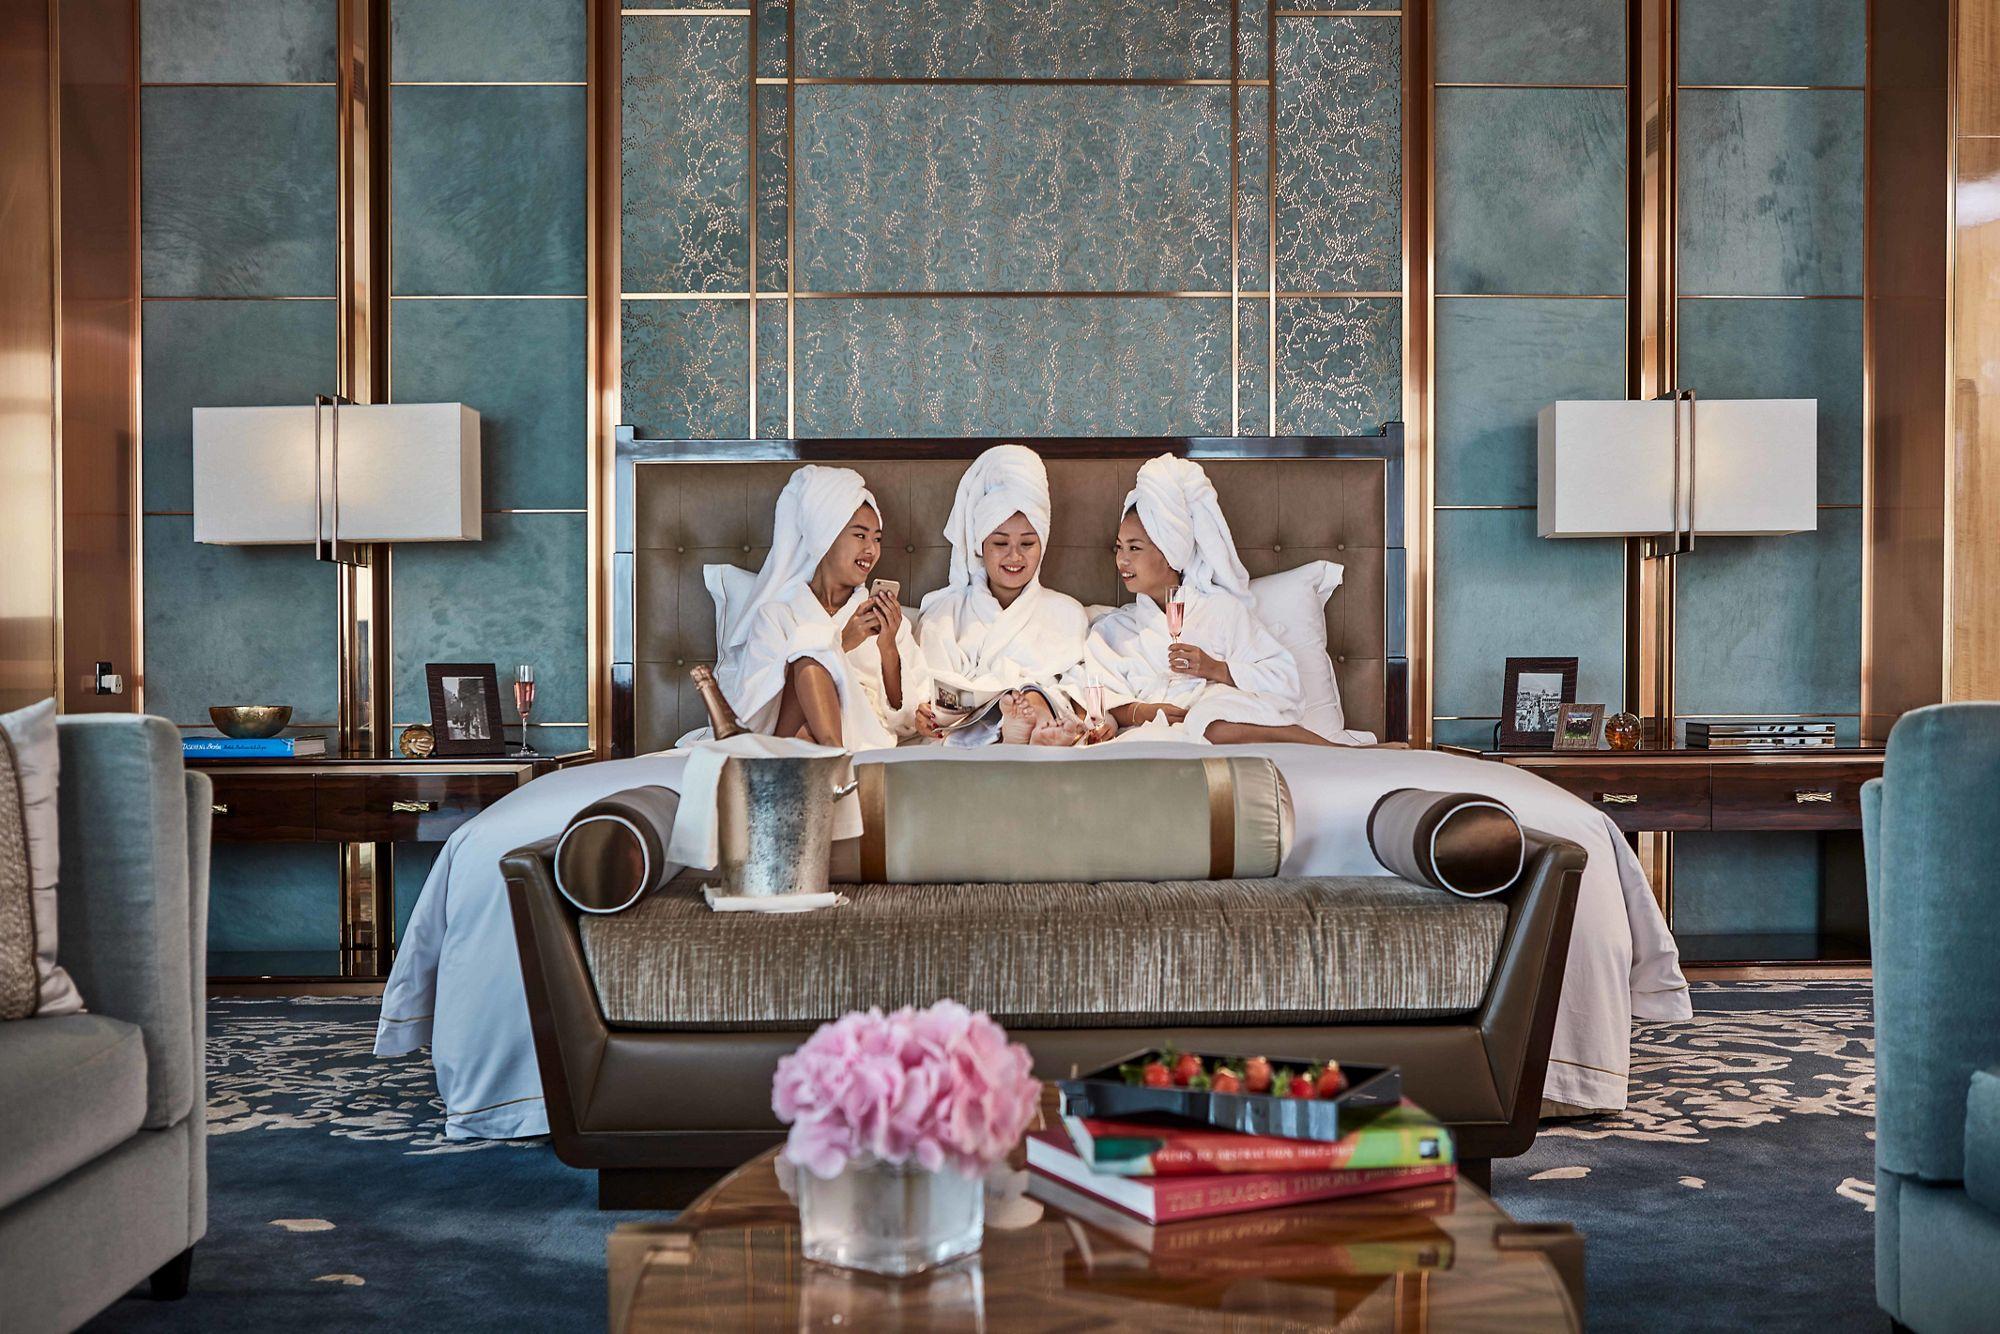 The Ritz-Carlton Suite bedroom with ladies